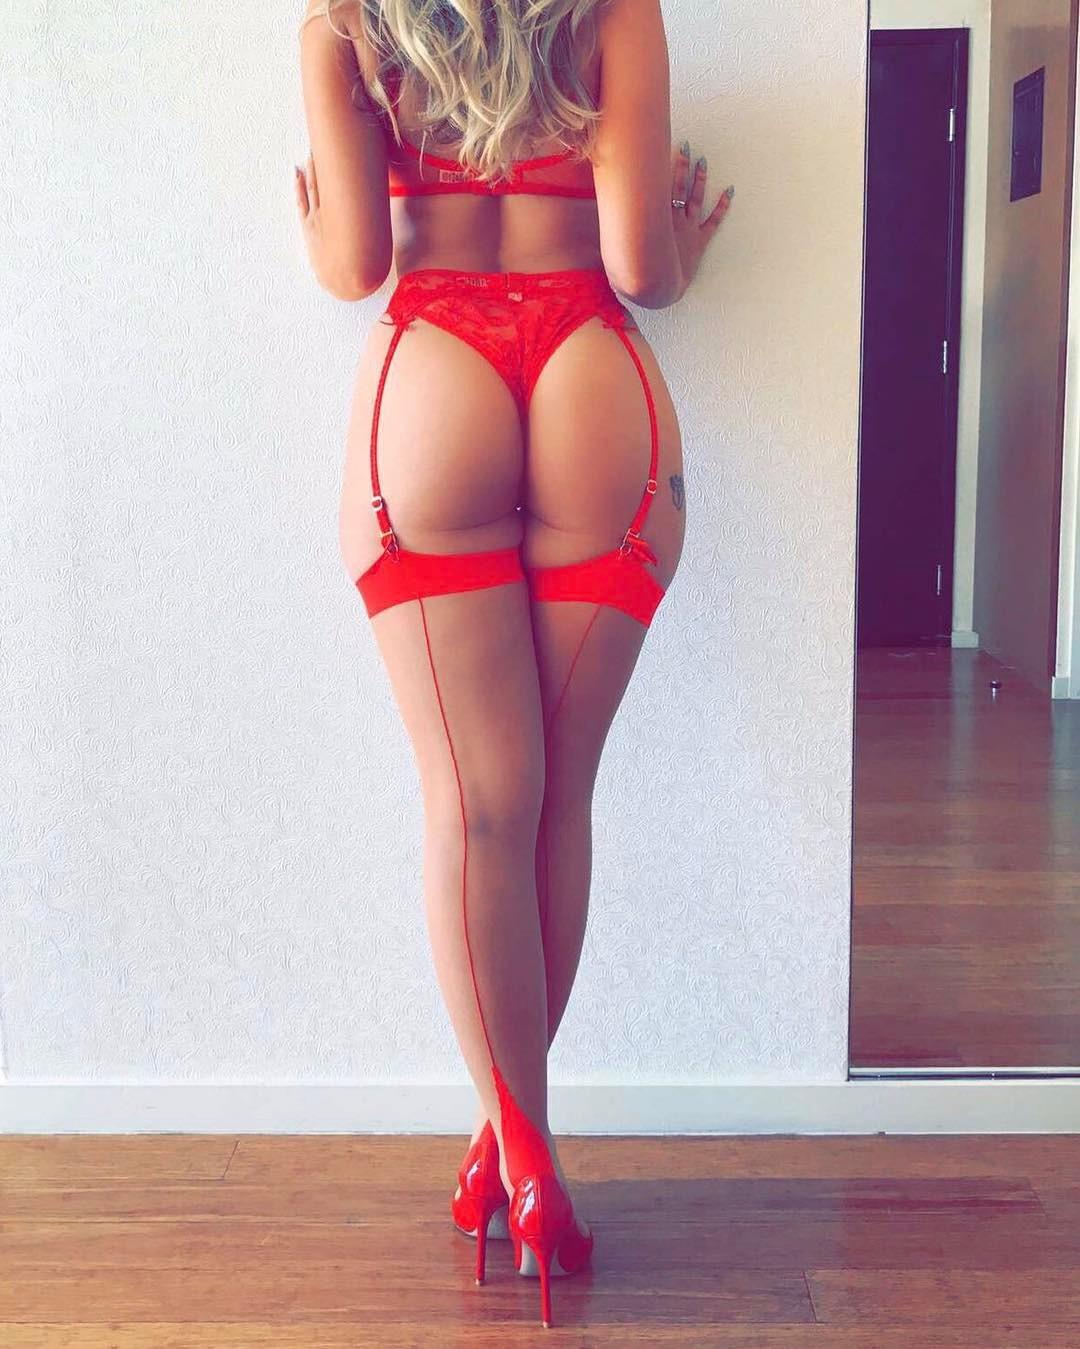 Elizabeth Turner Sexy Compilation Video,Zoie burgher sexy topless Hot gallery Grazi massafera nude 7 Photos,Mellisa clarke